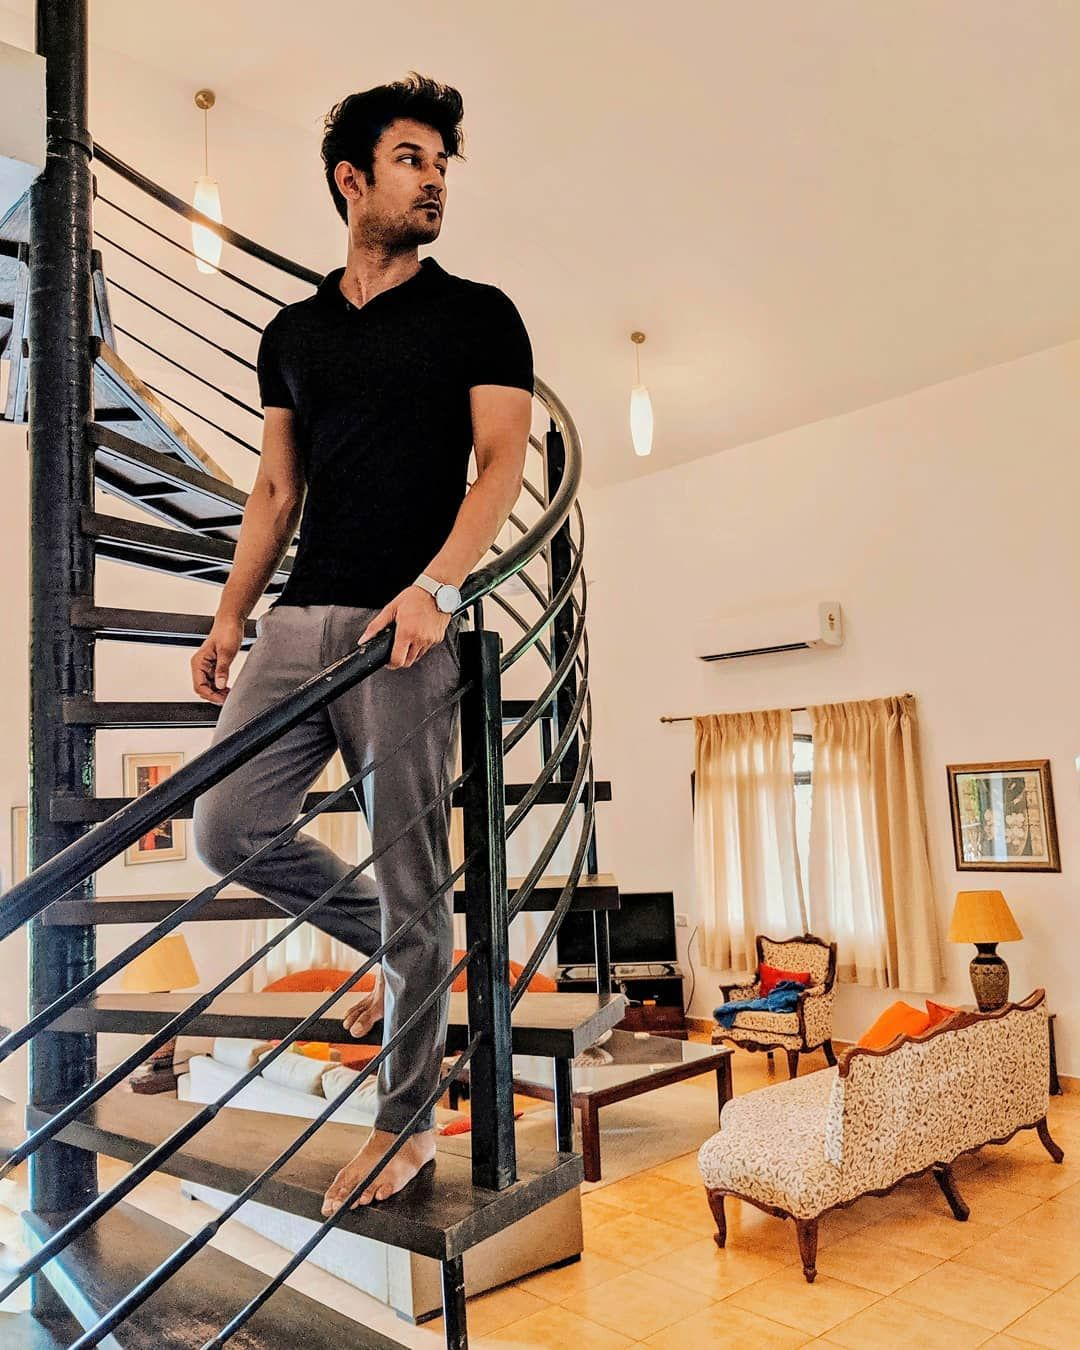 What would you do if you had an entire villa to yourself? 🤔      #goa #goaindia #indiatourism #goatourism #travelblogger #indiantravelblogger #colourful #candolim #goabeaches #calangut #midweekblues #goavillas #villasforrent #rentalvillas #fashionblogger #indianfashionblogger